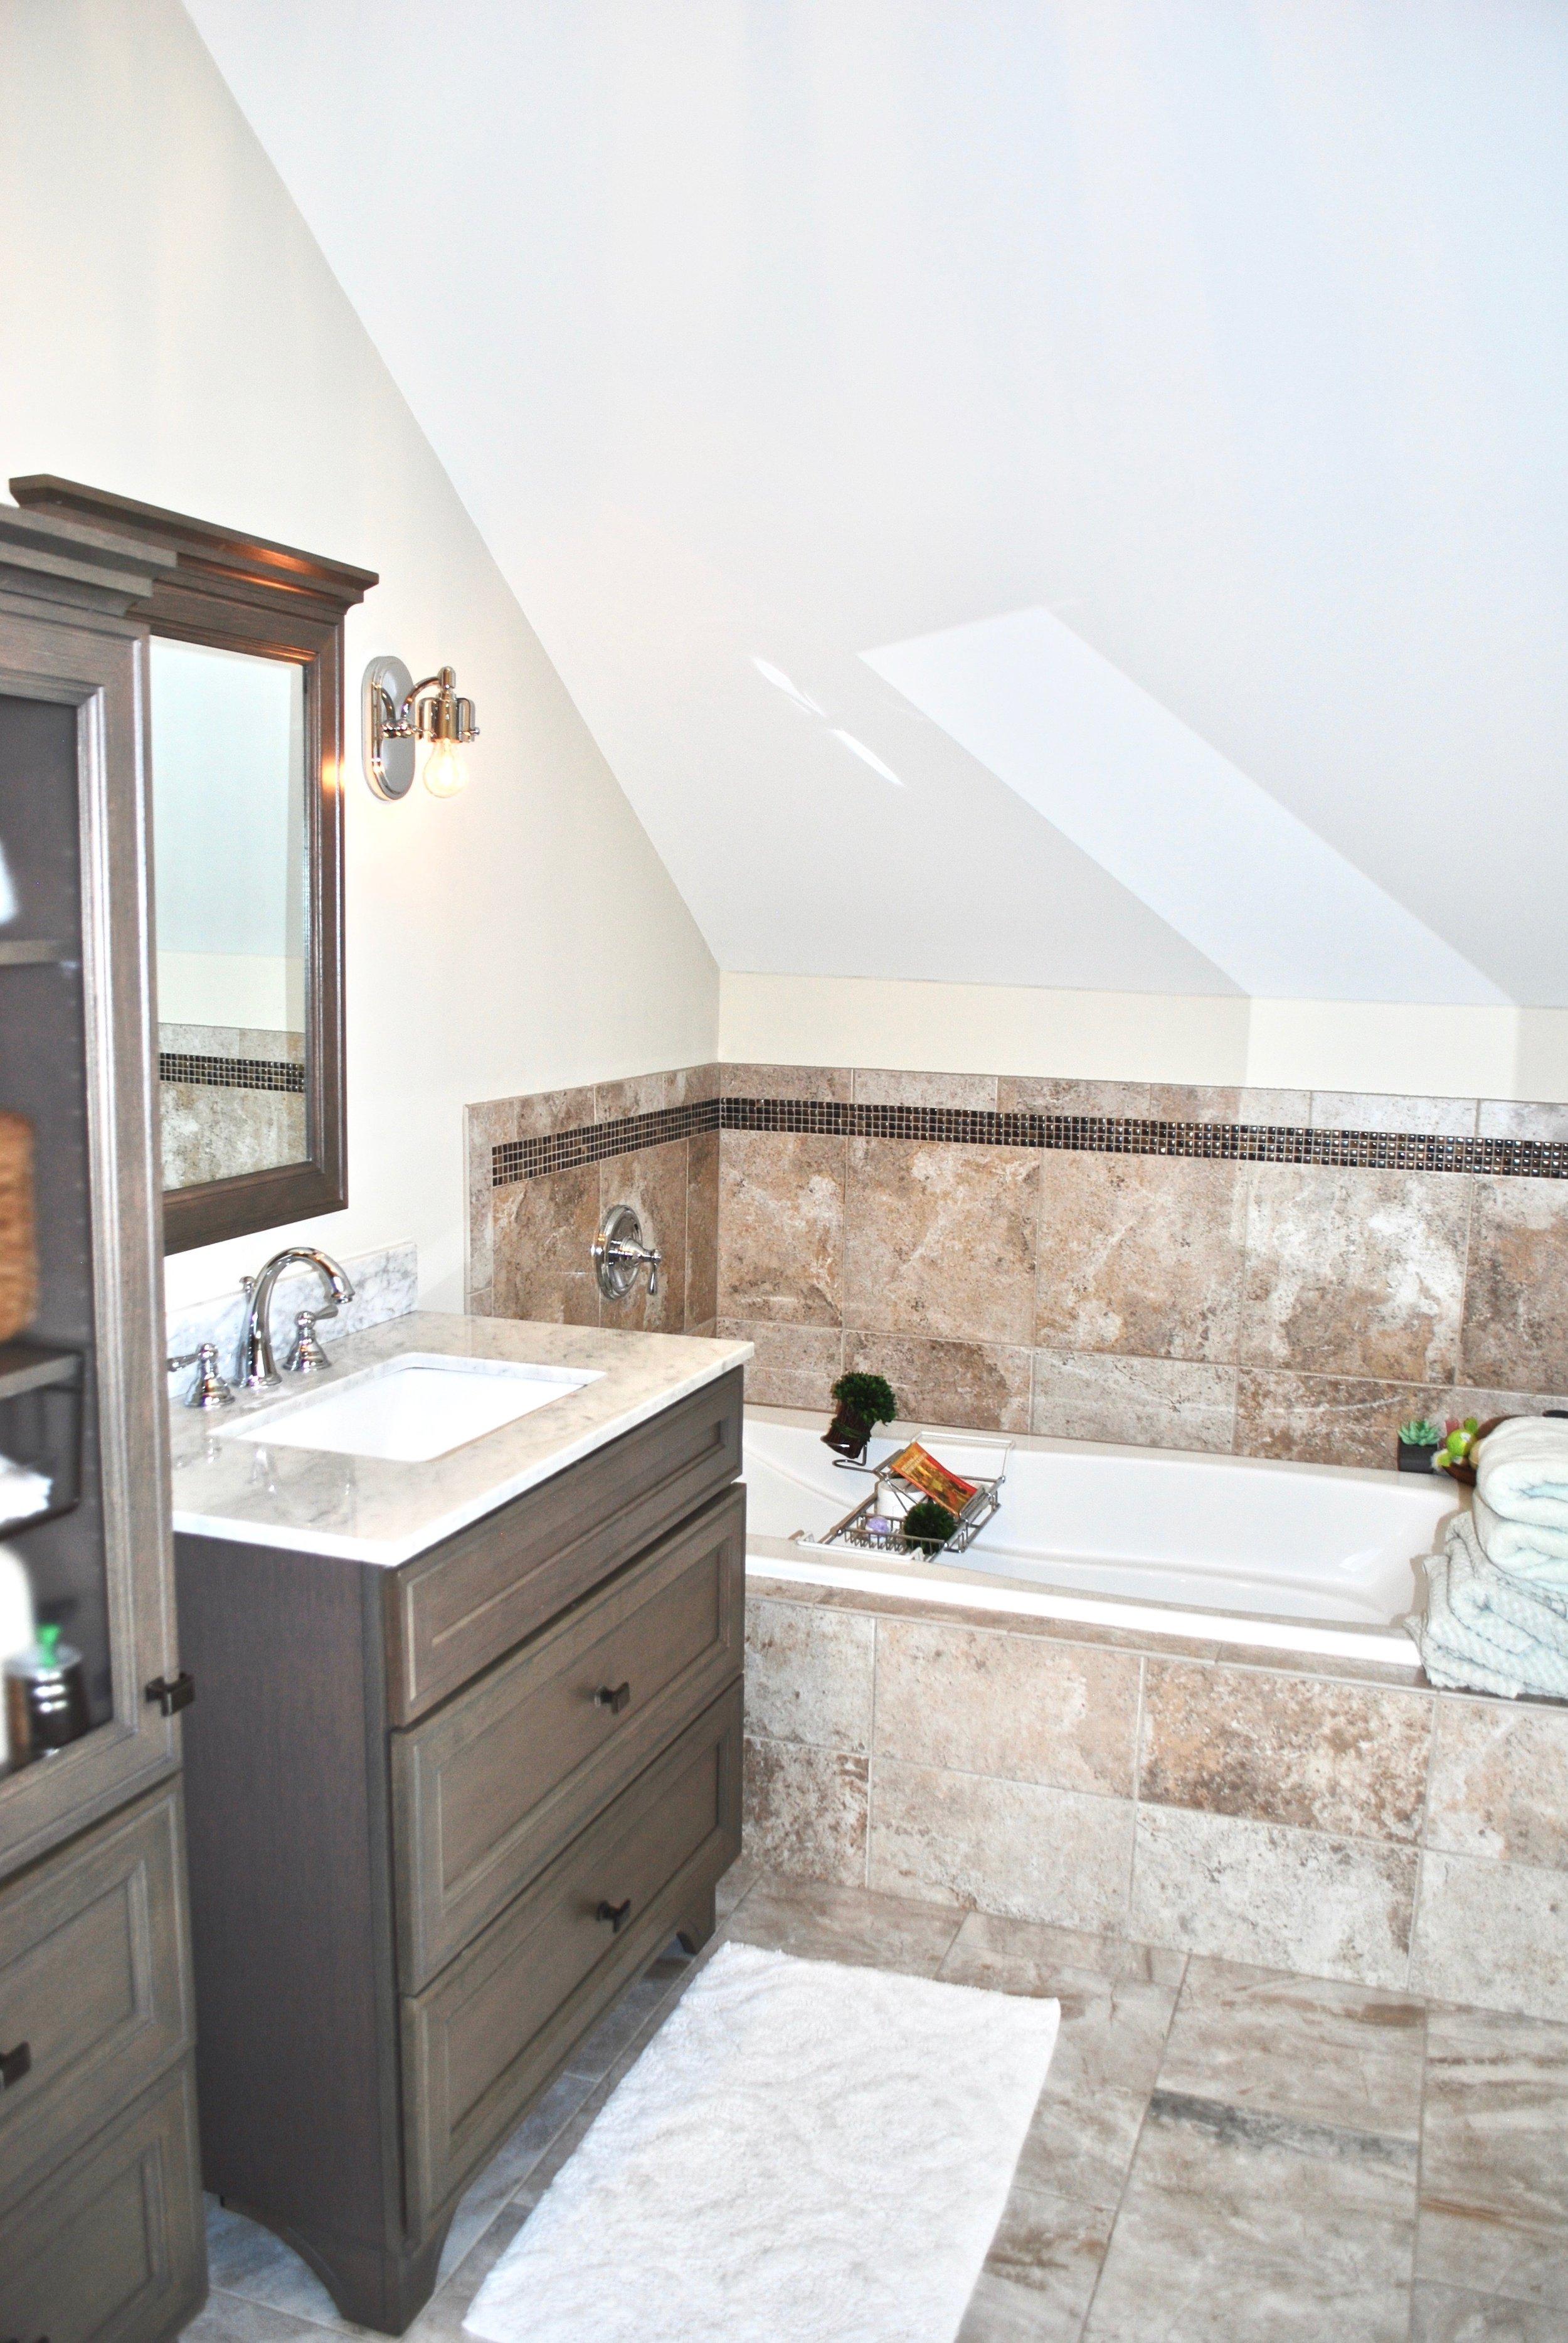 Attic Bathroom Addition in Illinois